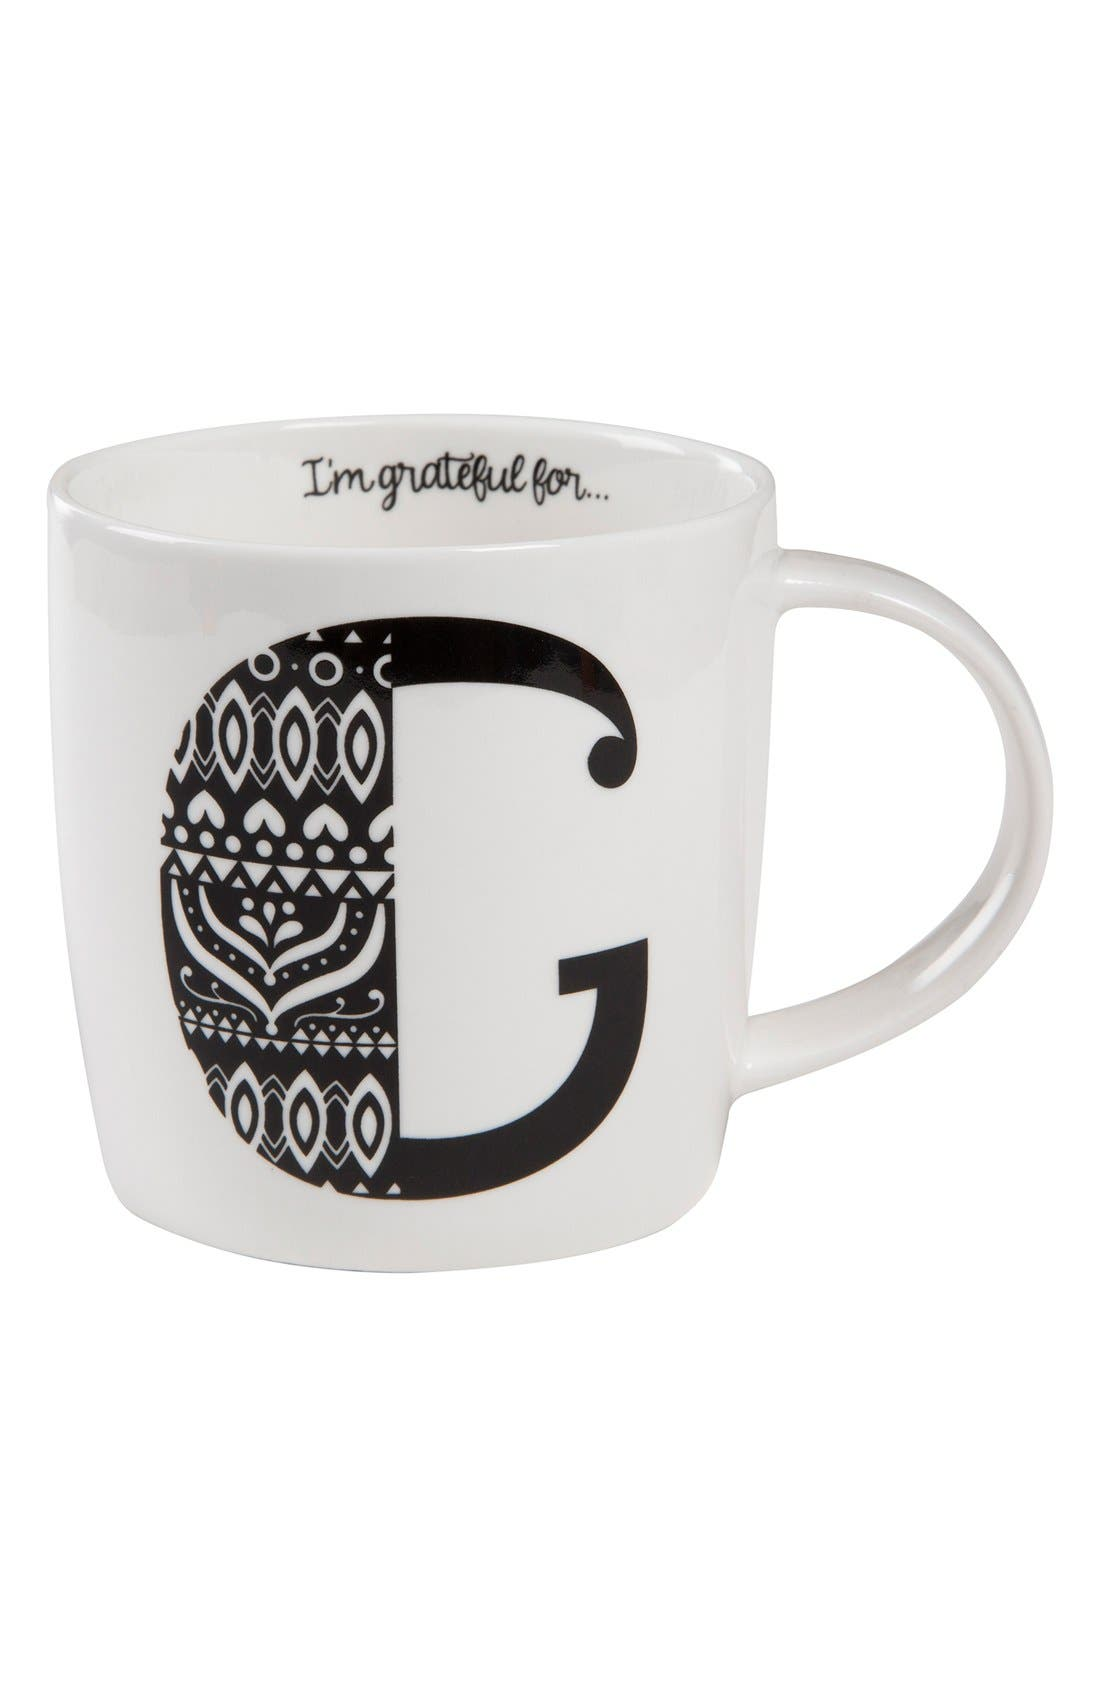 Initial Ceramic Mug,                             Main thumbnail 1, color,                             White - G